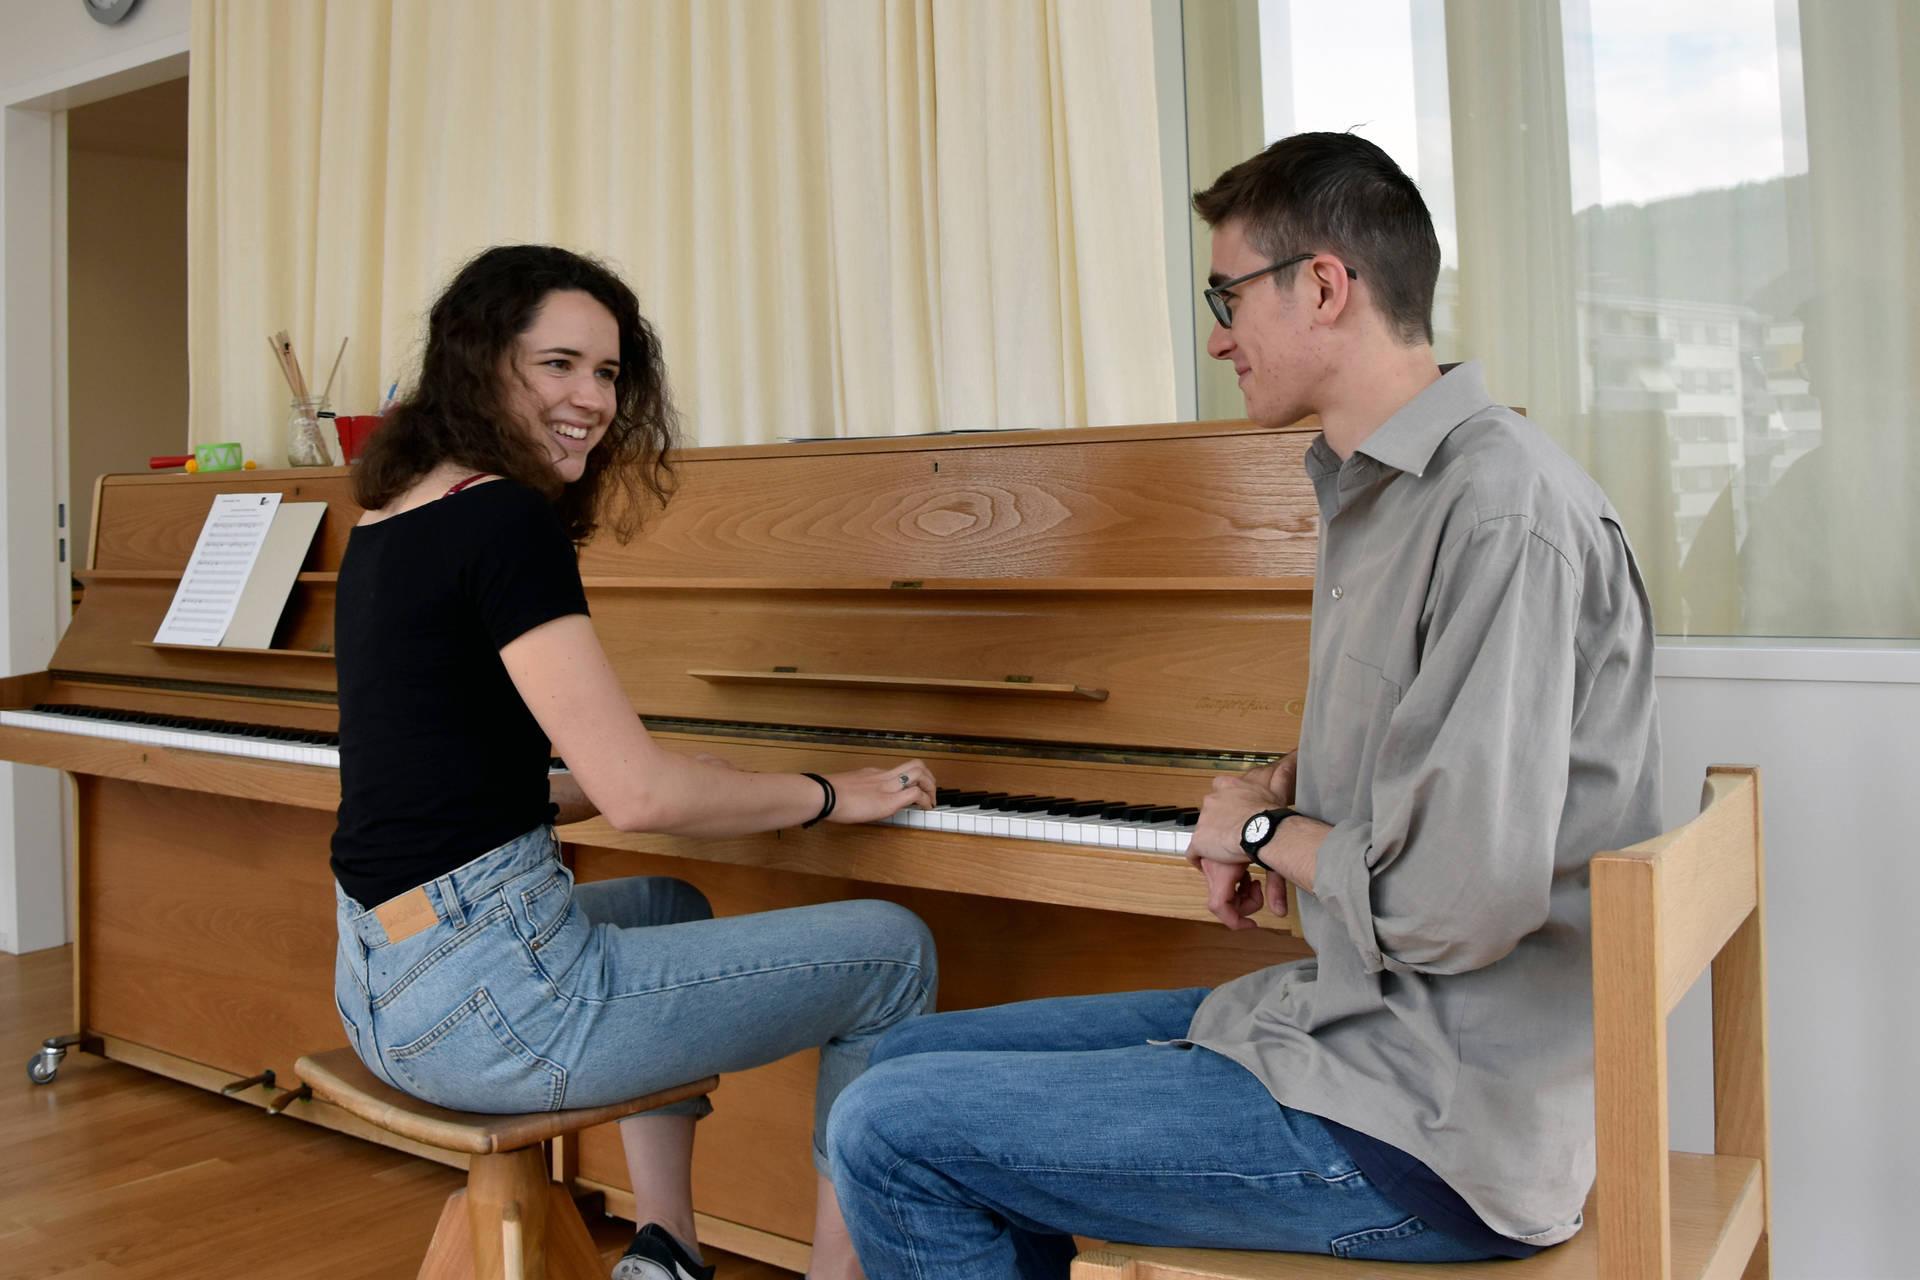 Selina Portner und Adrian Vulic loben den Bilingualen Studiengang in den höchsten Tönen.